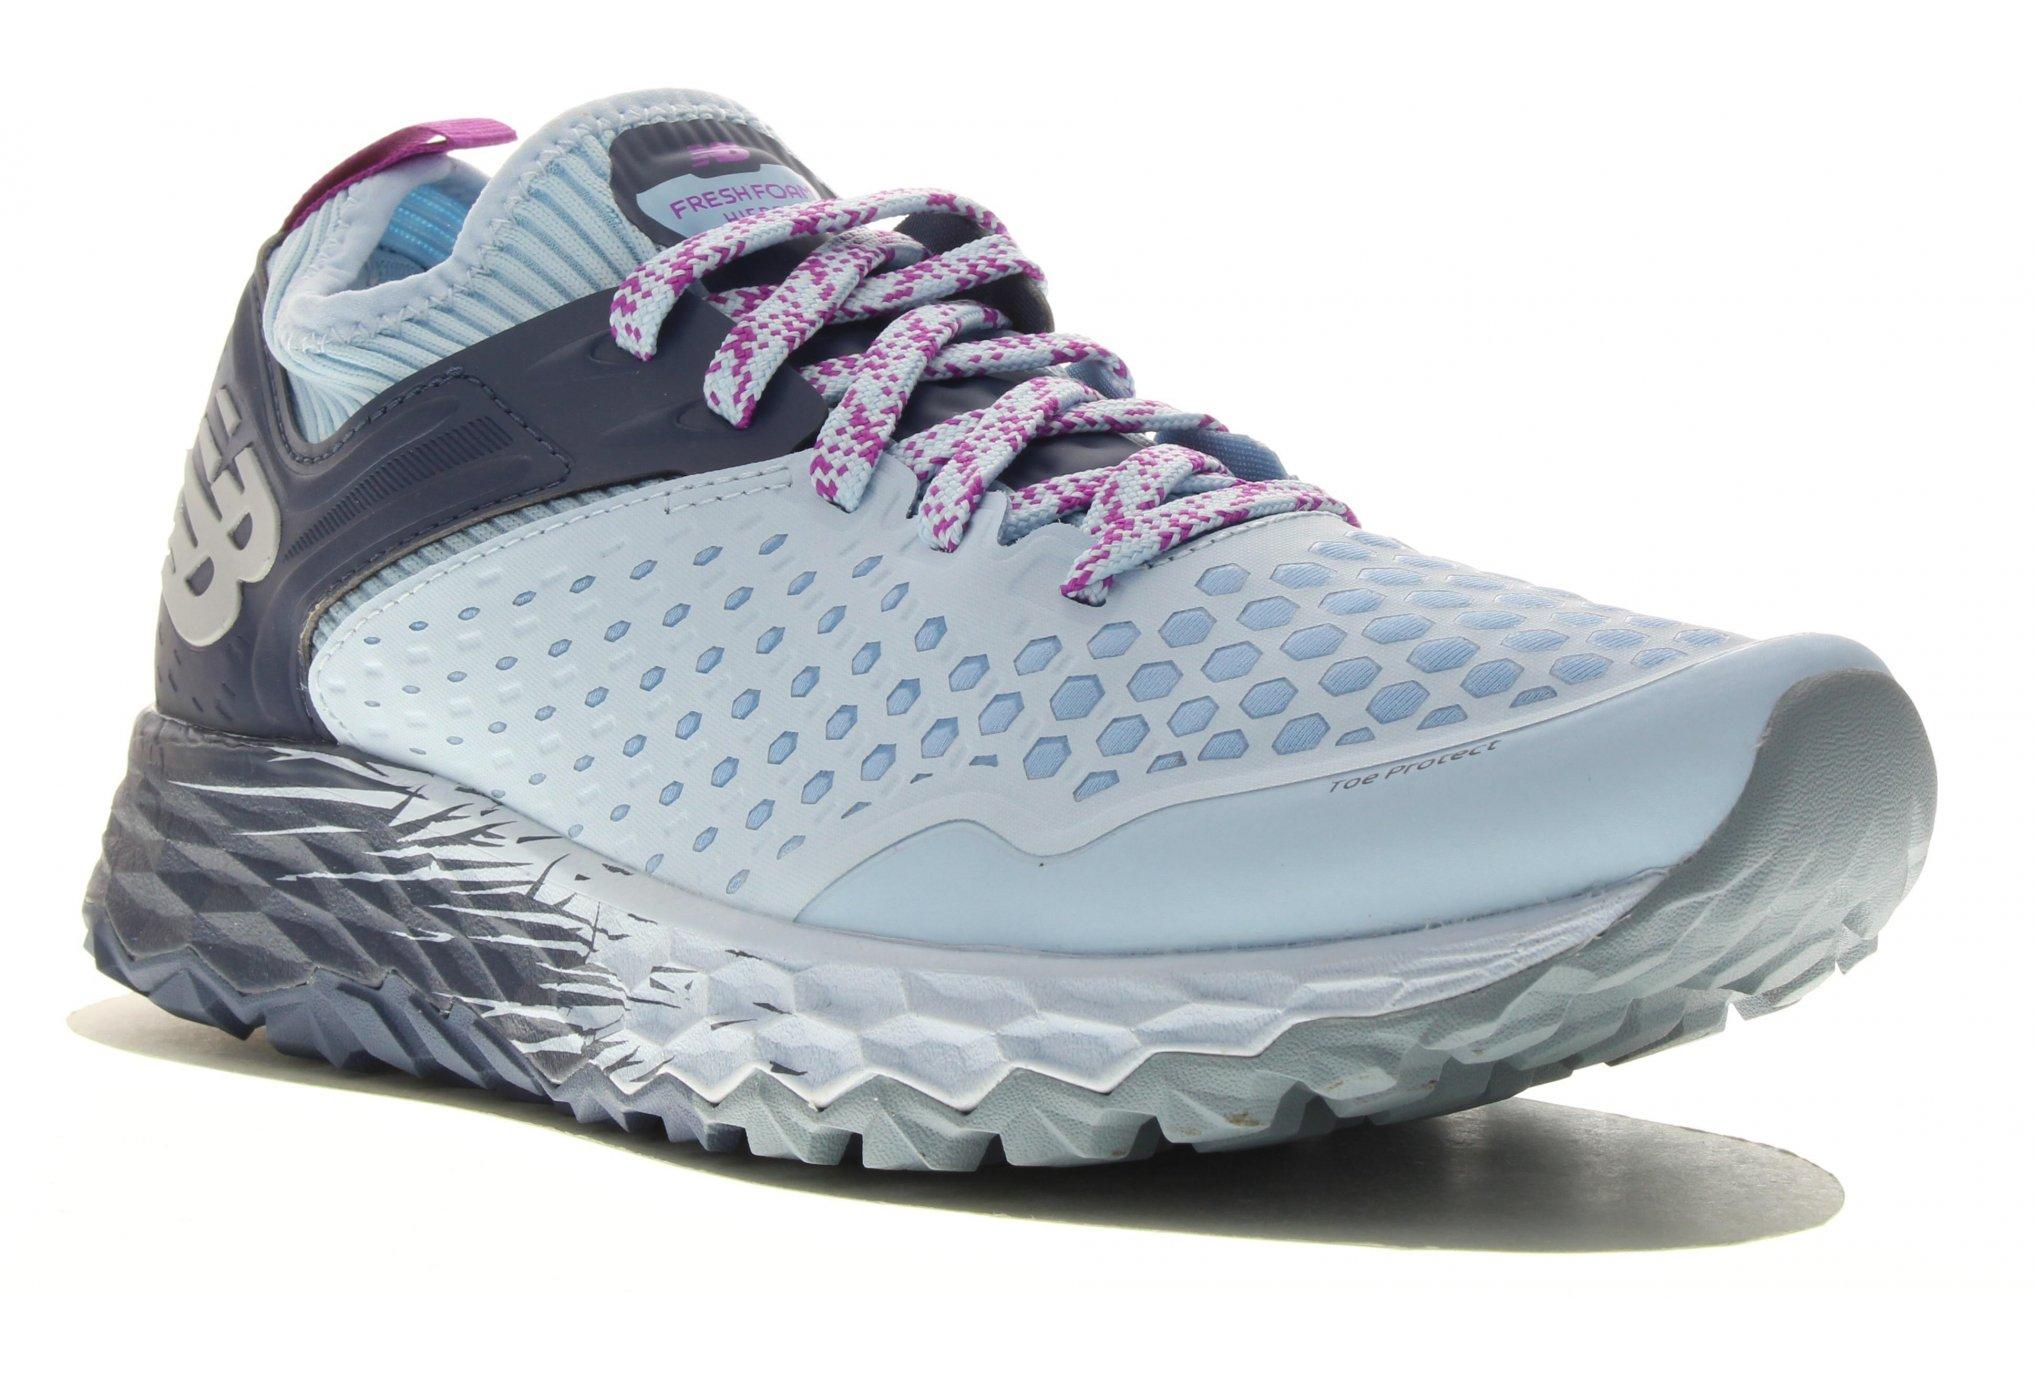 New Balance Fresh Foam Hierro V4 Chaussures running femme